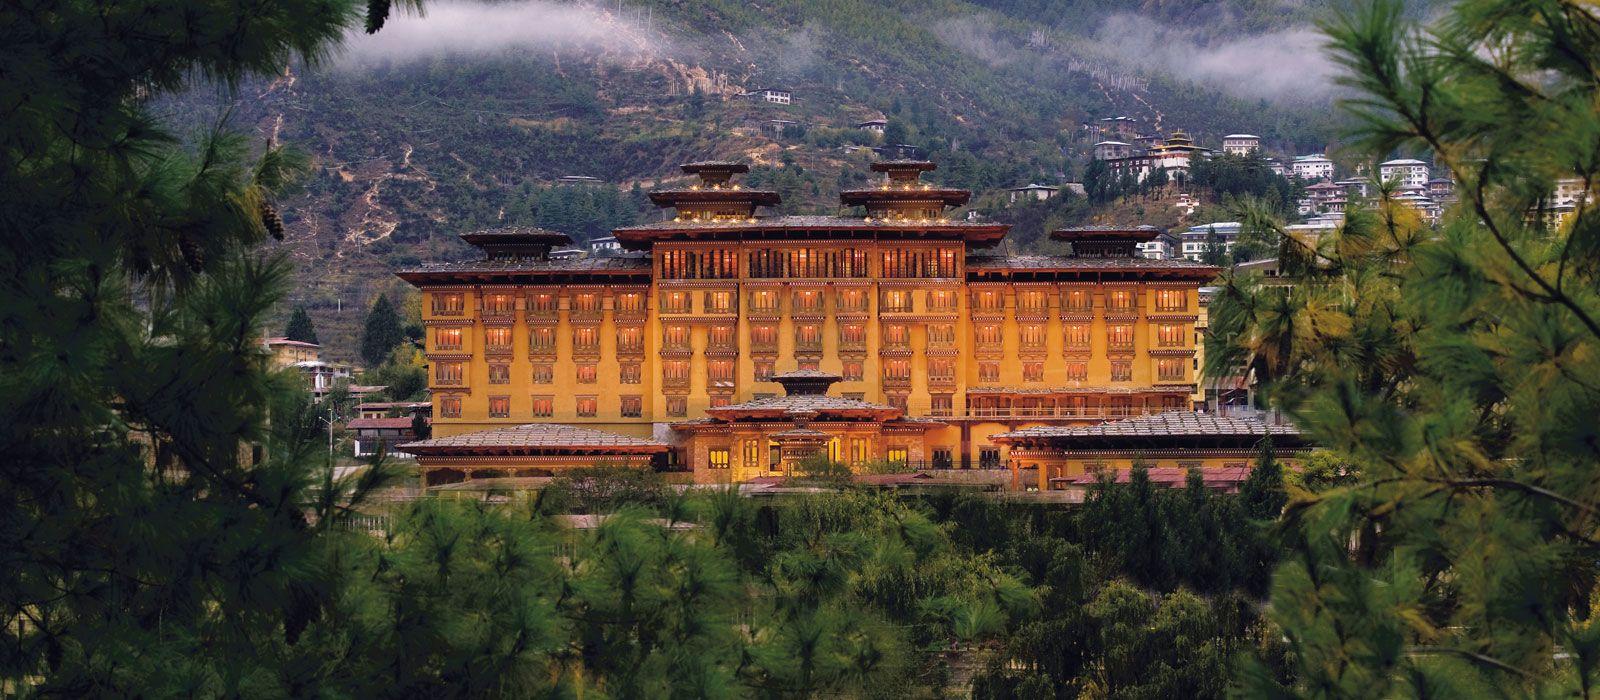 Luxury Bhutan & Thailand Paradise Islands Tour Trip 1